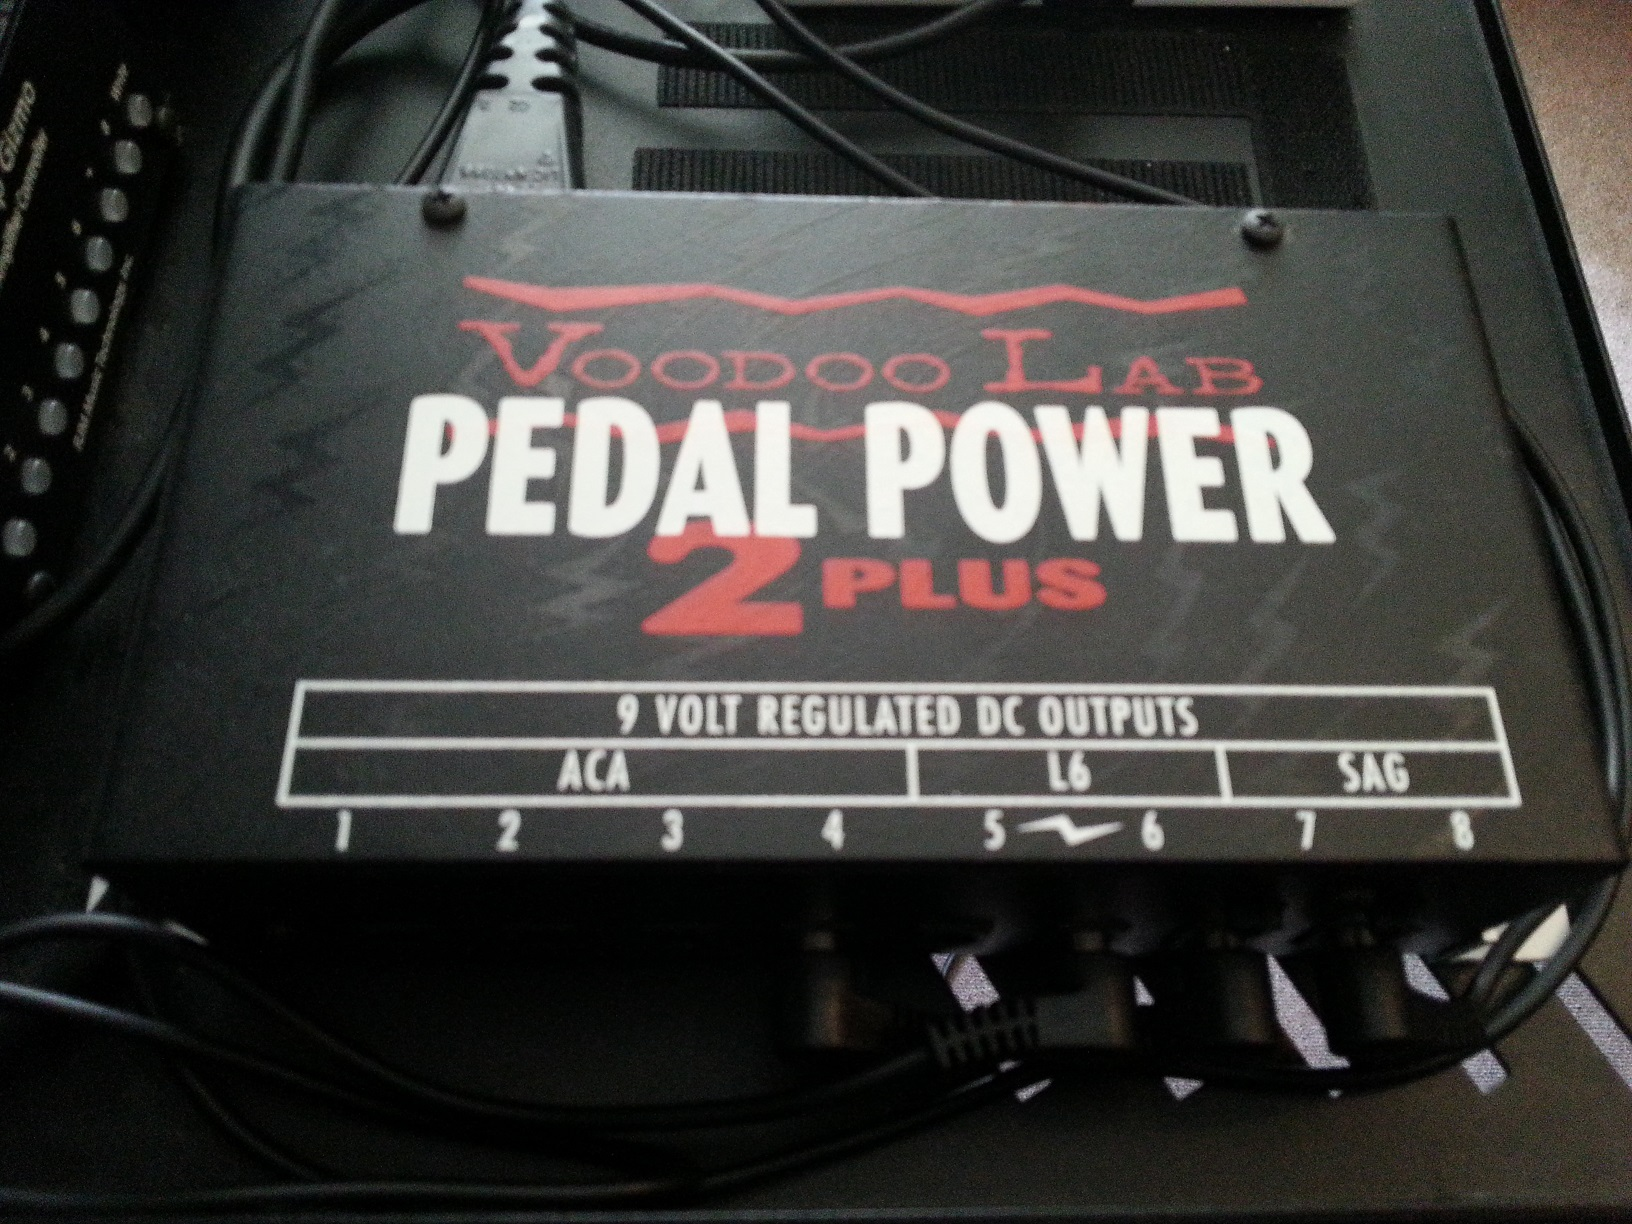 voodoo lab pedal power 2 plus image 892151 audiofanzine. Black Bedroom Furniture Sets. Home Design Ideas